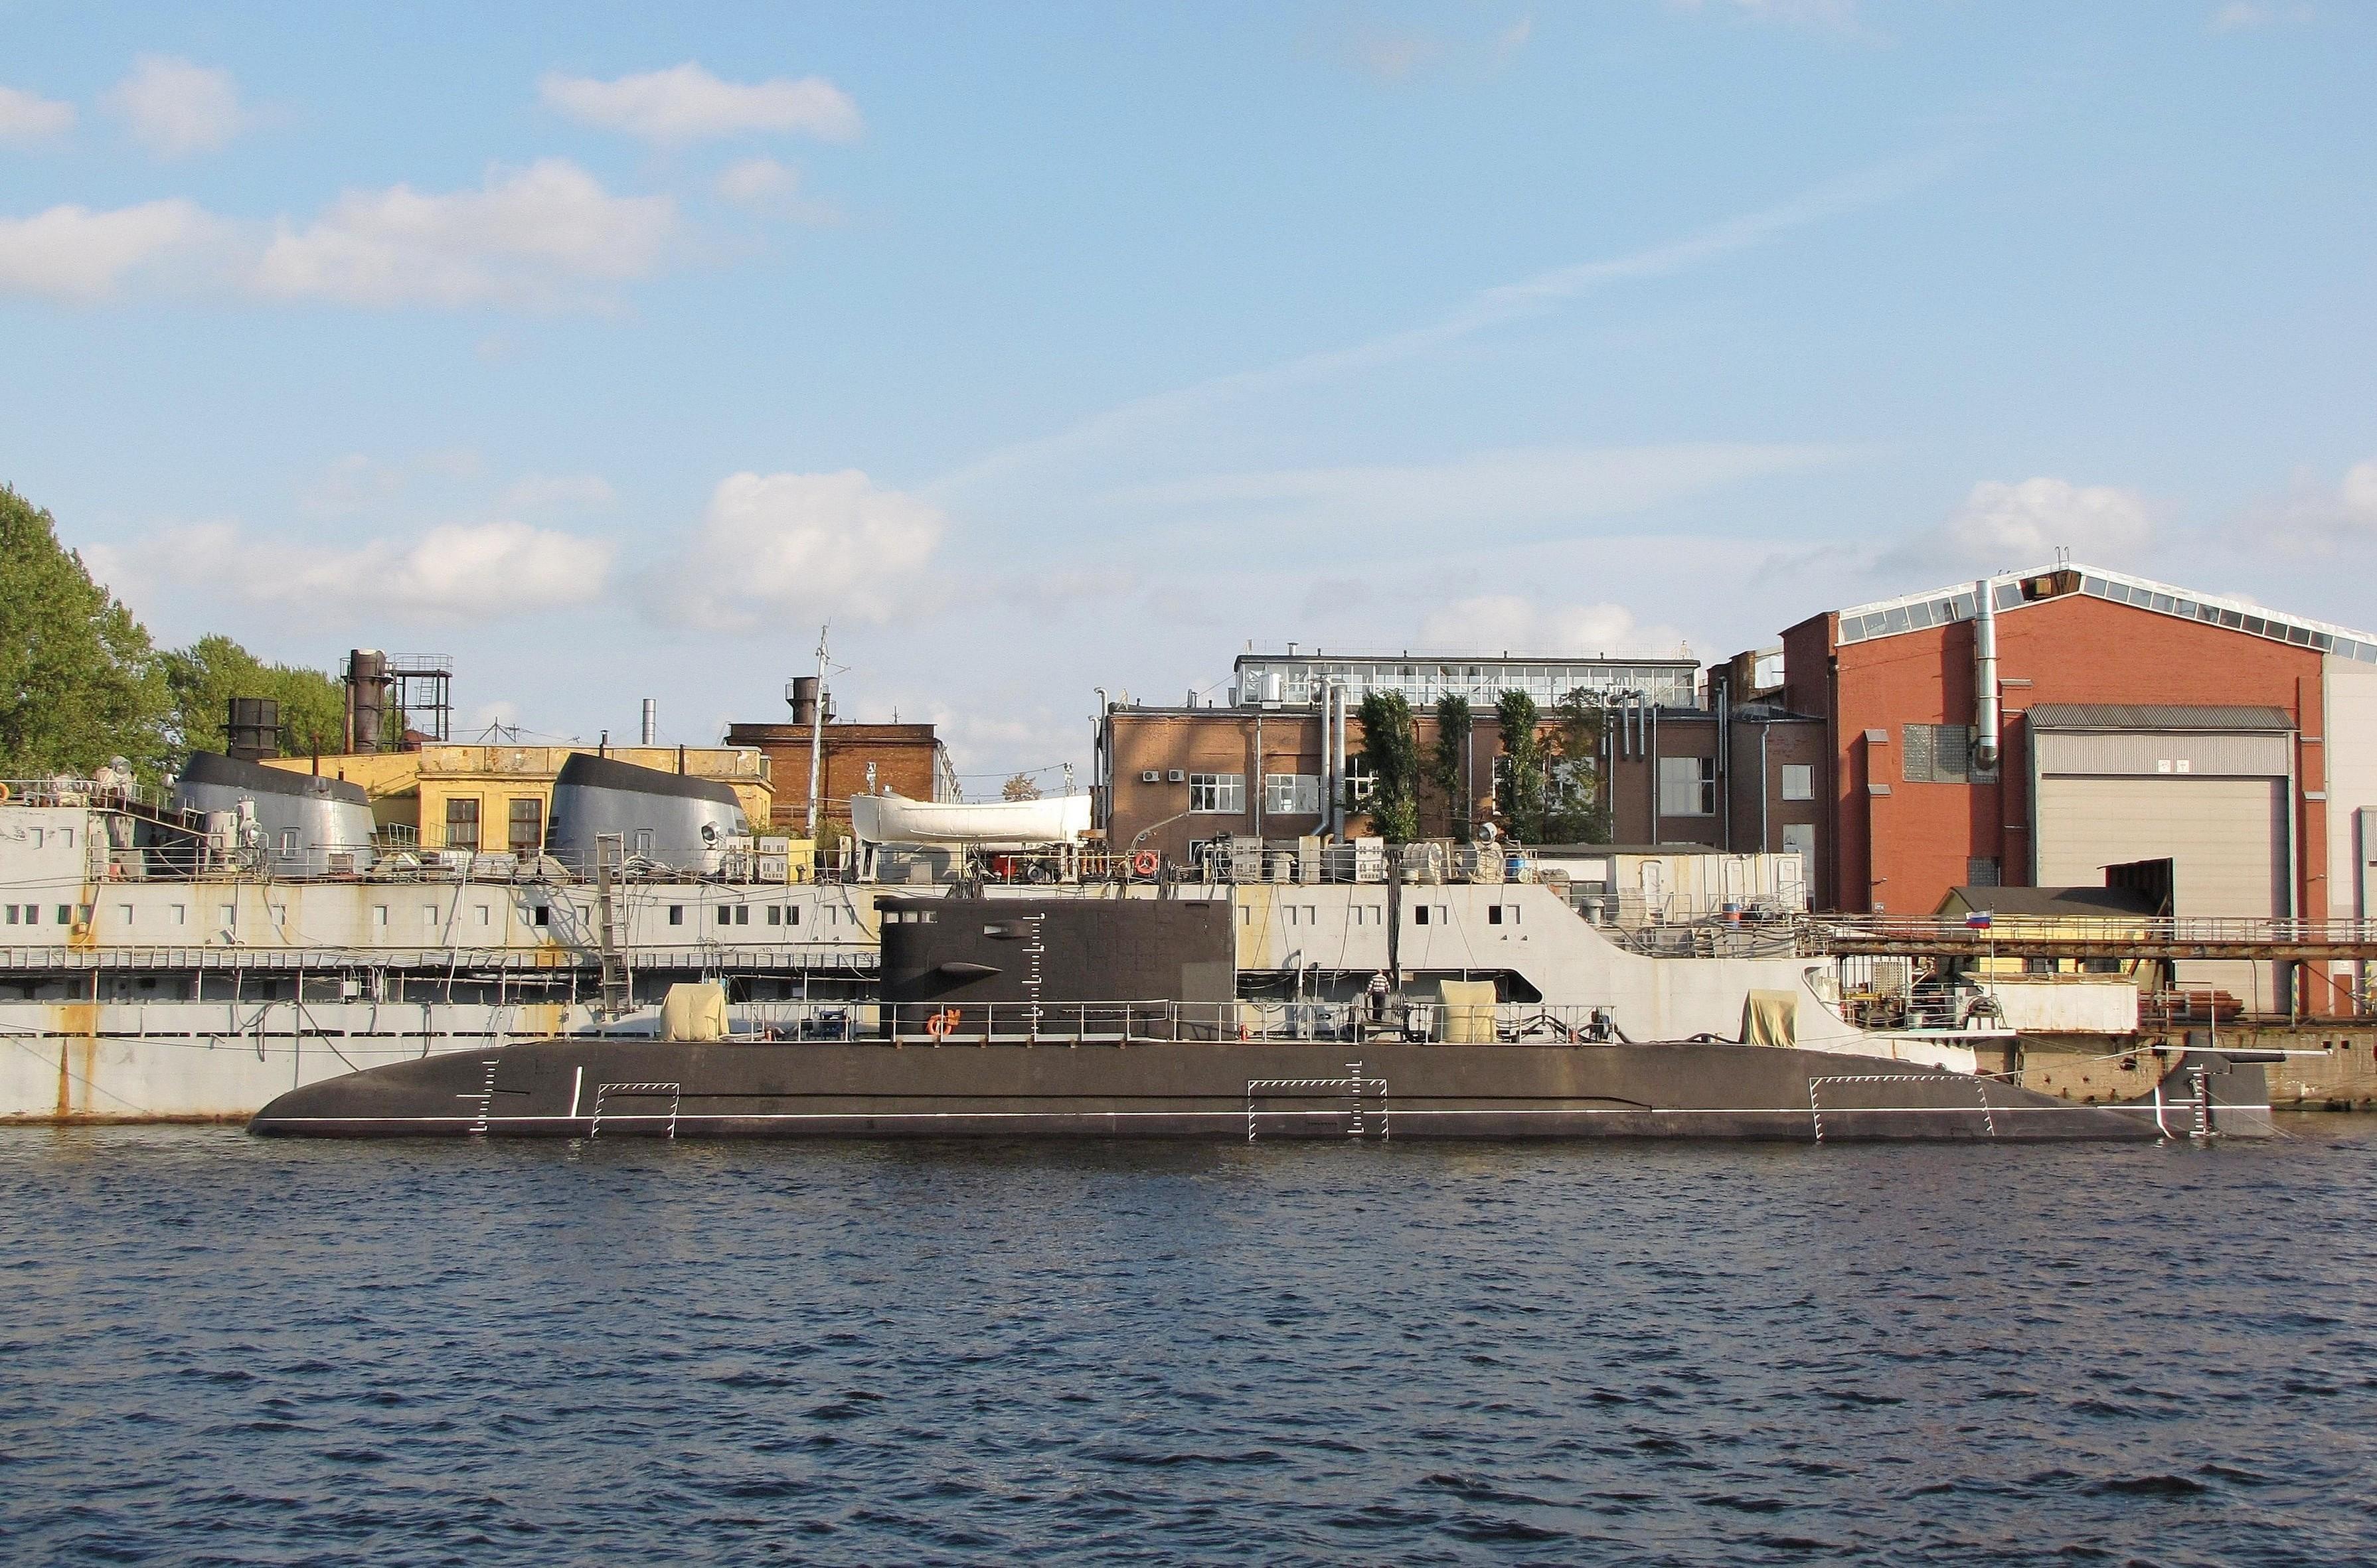 Project 677: Lada class Submarine - Page 15 04-6732461-677-napl-b-586-kronshtadt-22.09.2018